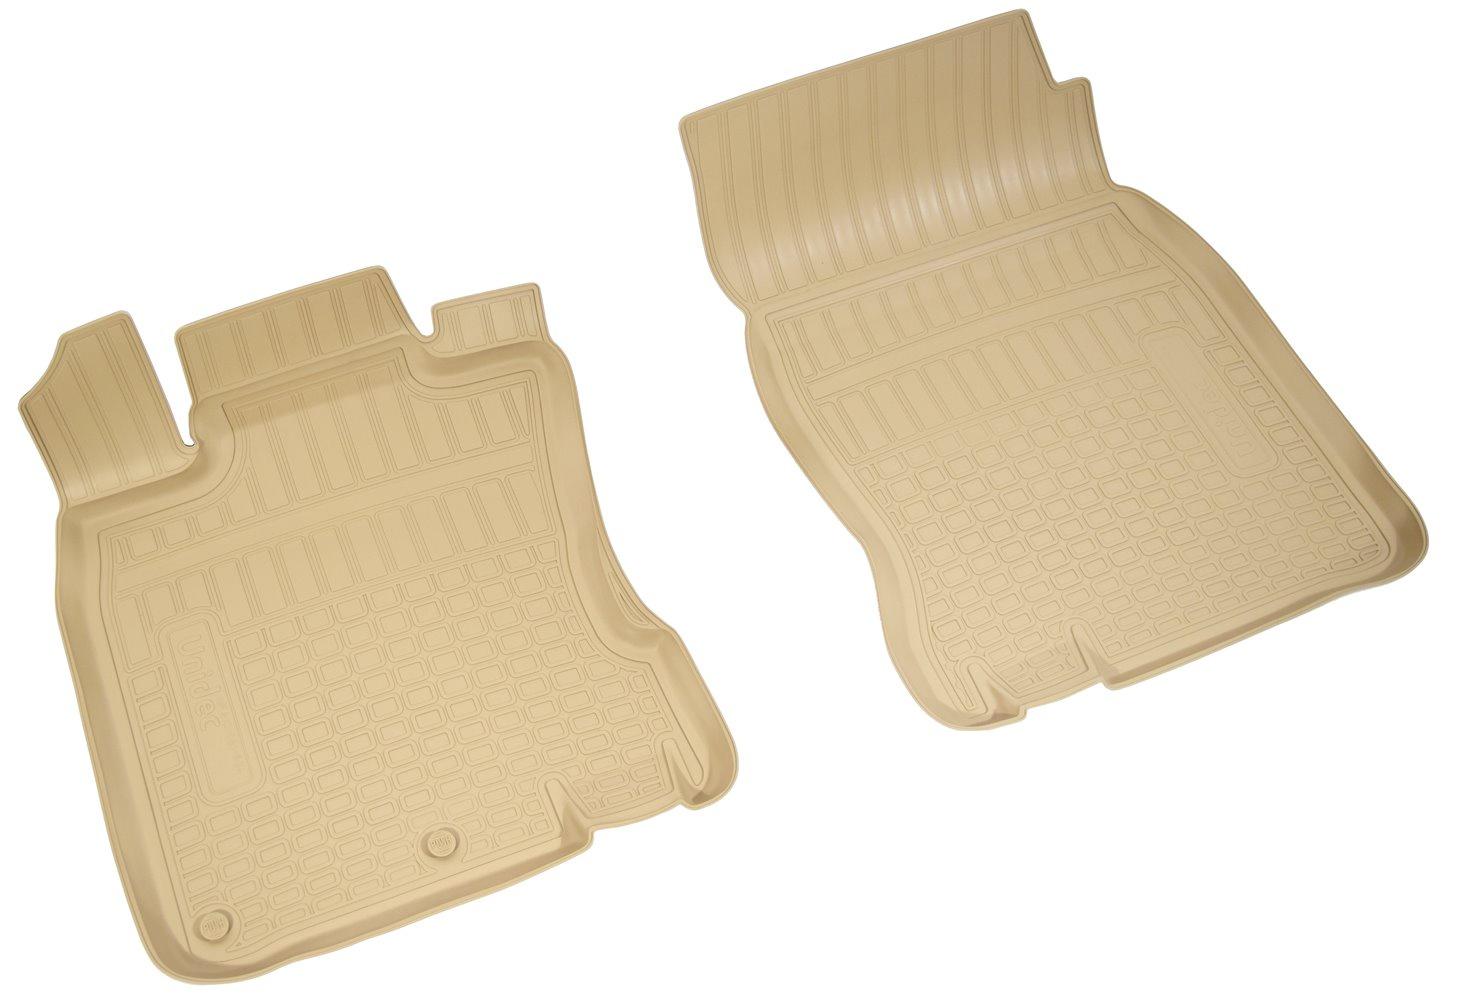 Коврики в салон автомобиля Norplast для Nissan Qashqai (J11) (2014) (пер) (английская сборка), NPA10-C61-604-B, бежевый цены